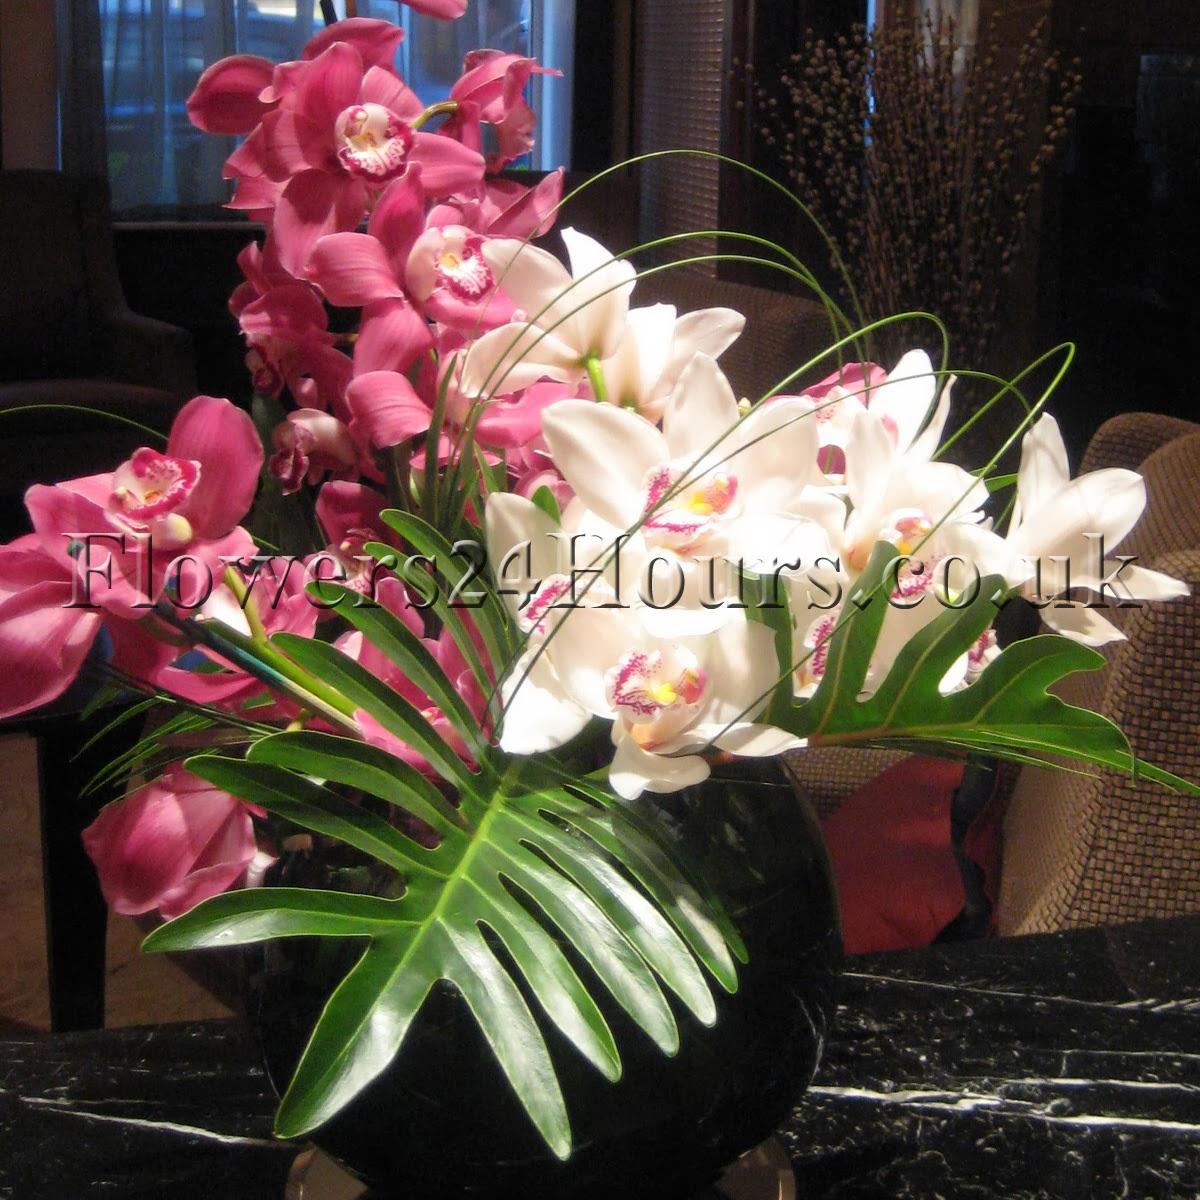 New Inspiring Selection Of Flower Arrangements From Uk Flower